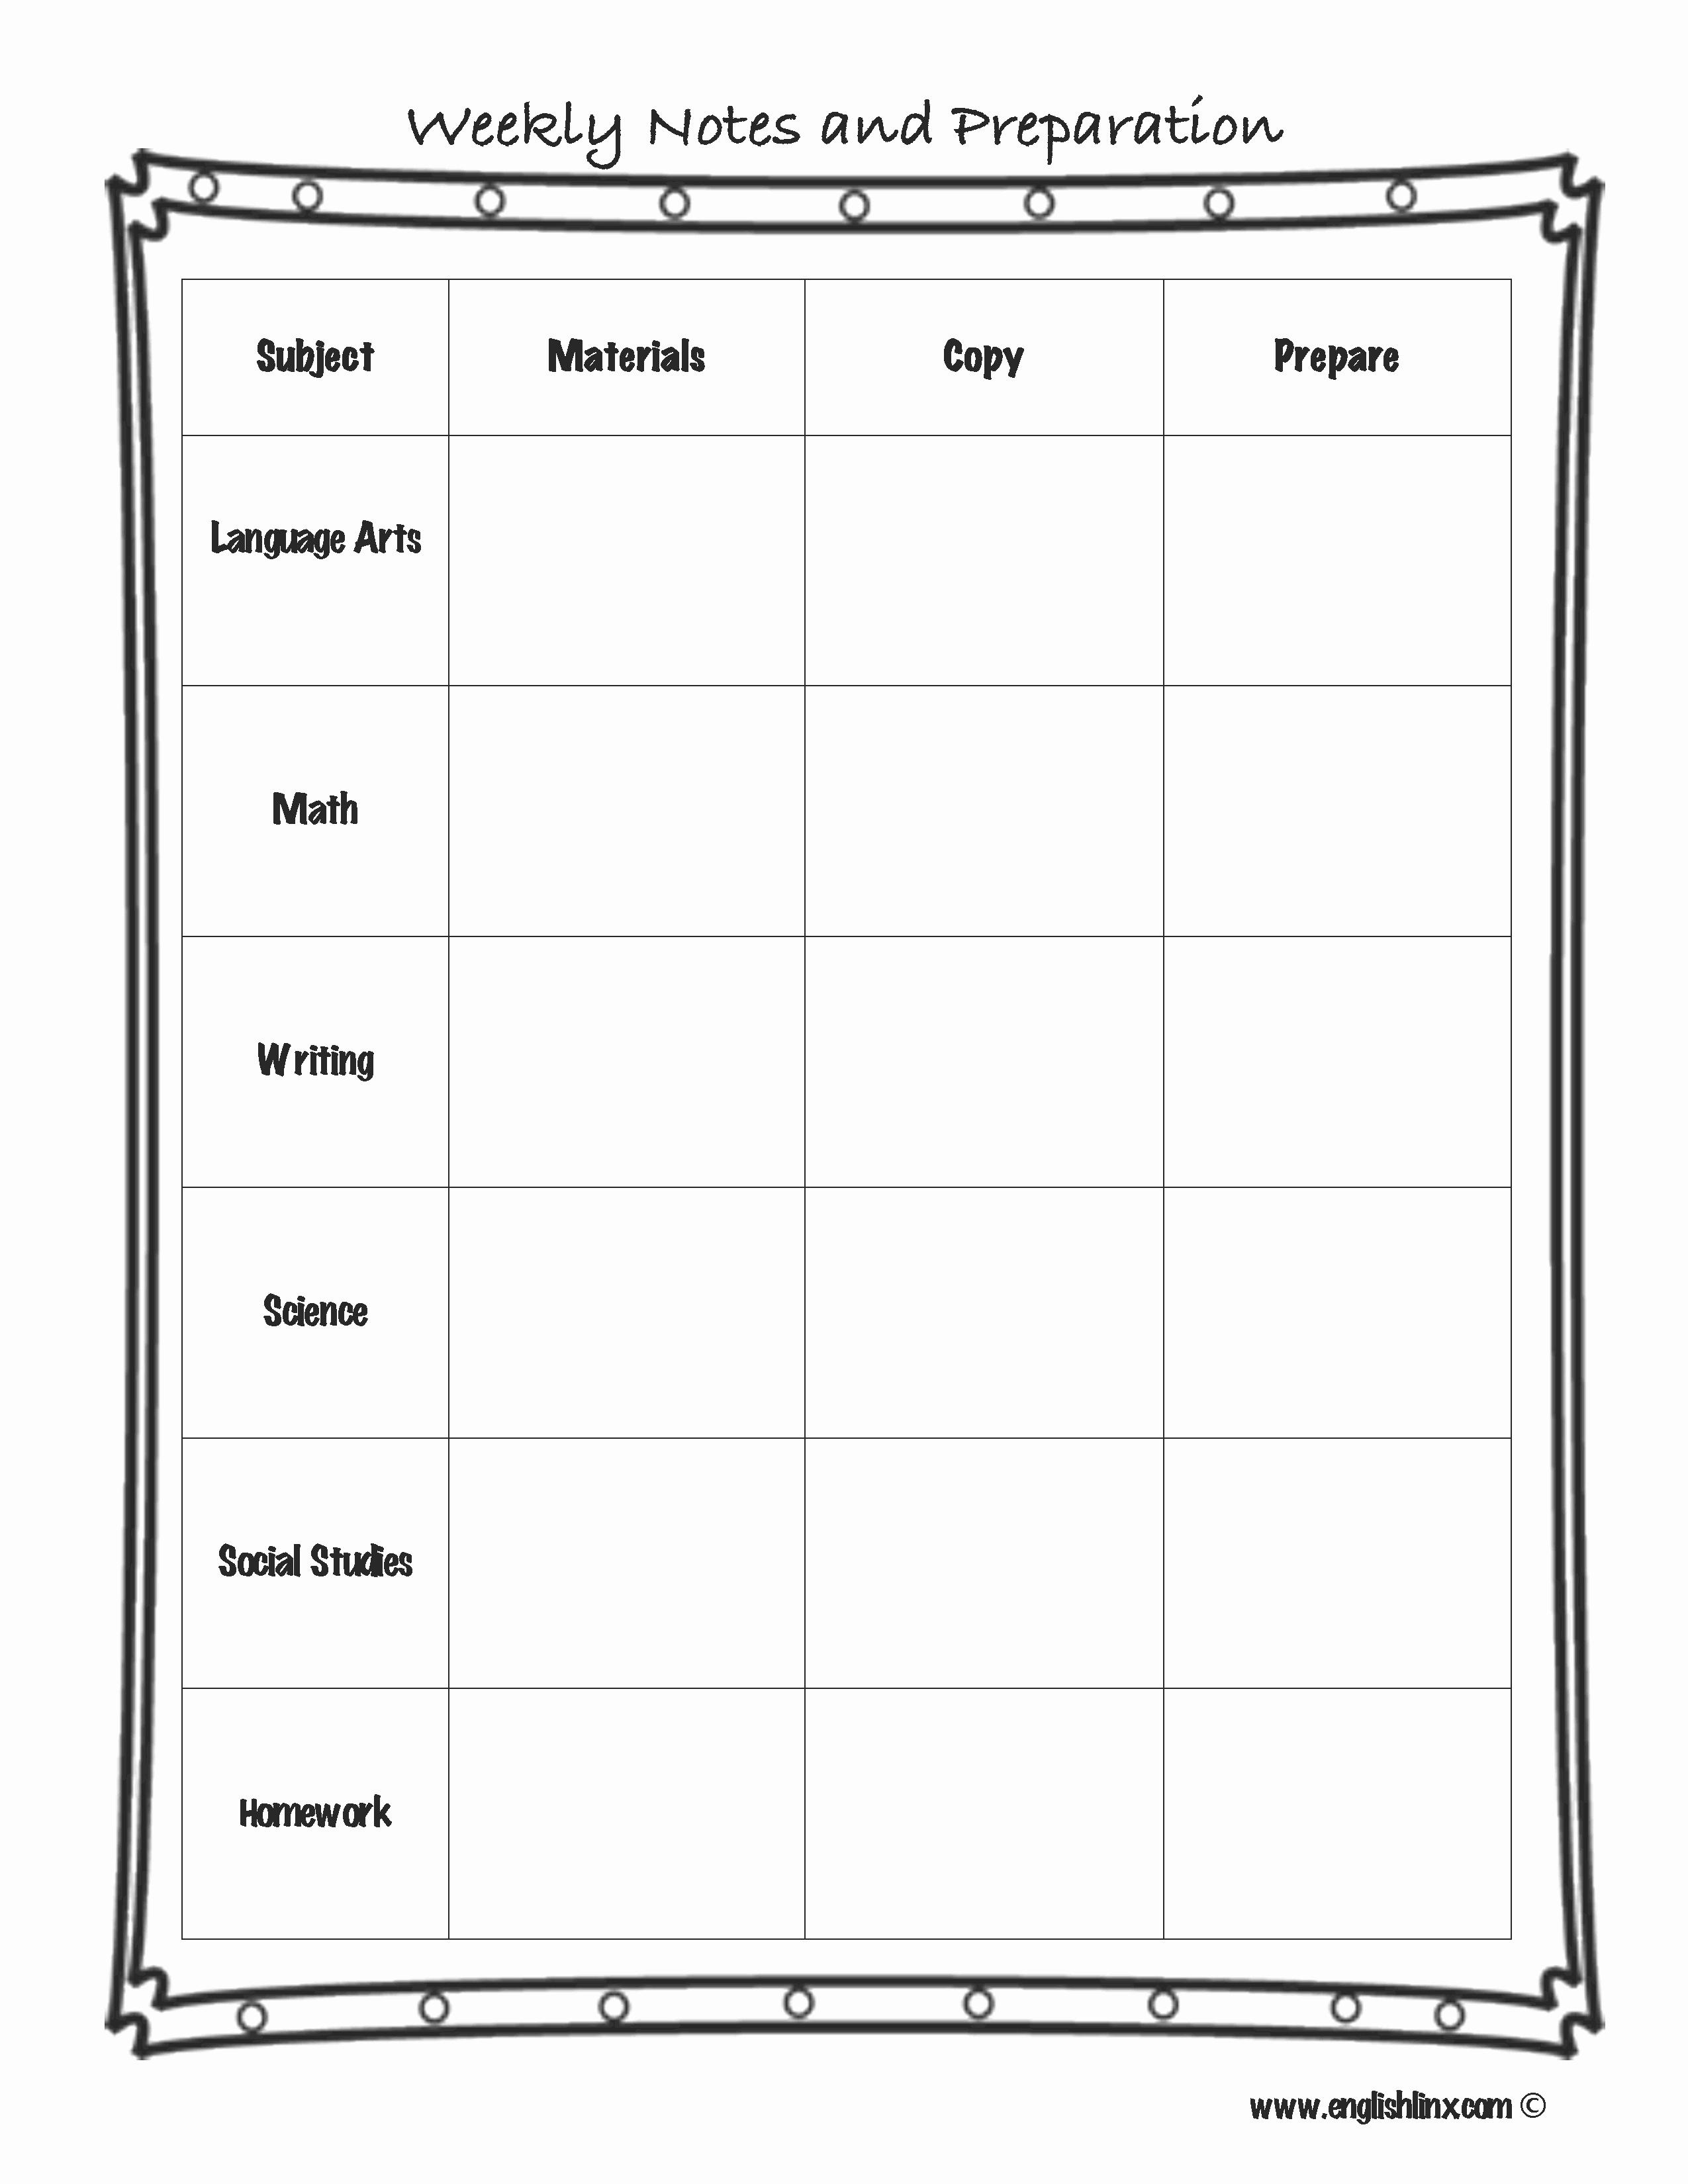 5th Grade Lesson Plan Template Beautiful 5th Grade Language Arts Lesson Plan Template Fifth Grade